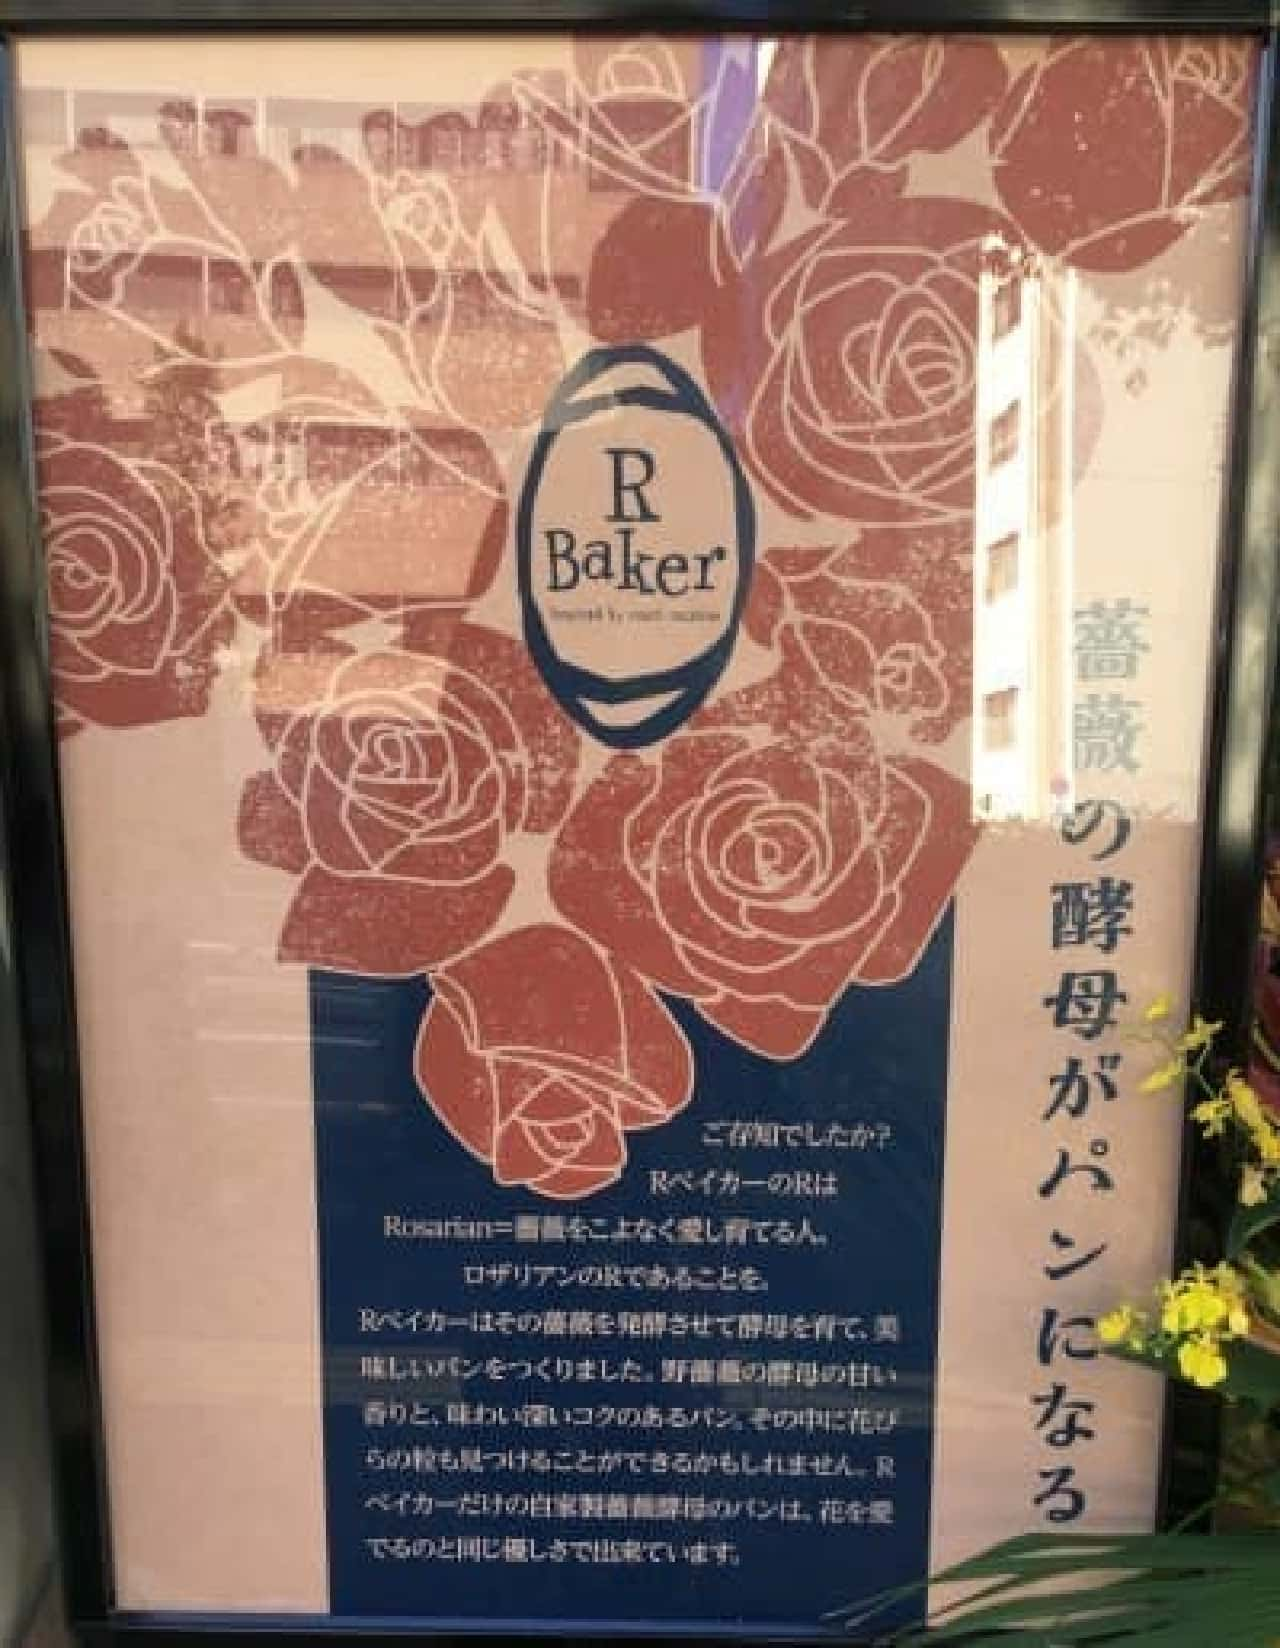 R Baker(アールベイカー)五反田店オープン